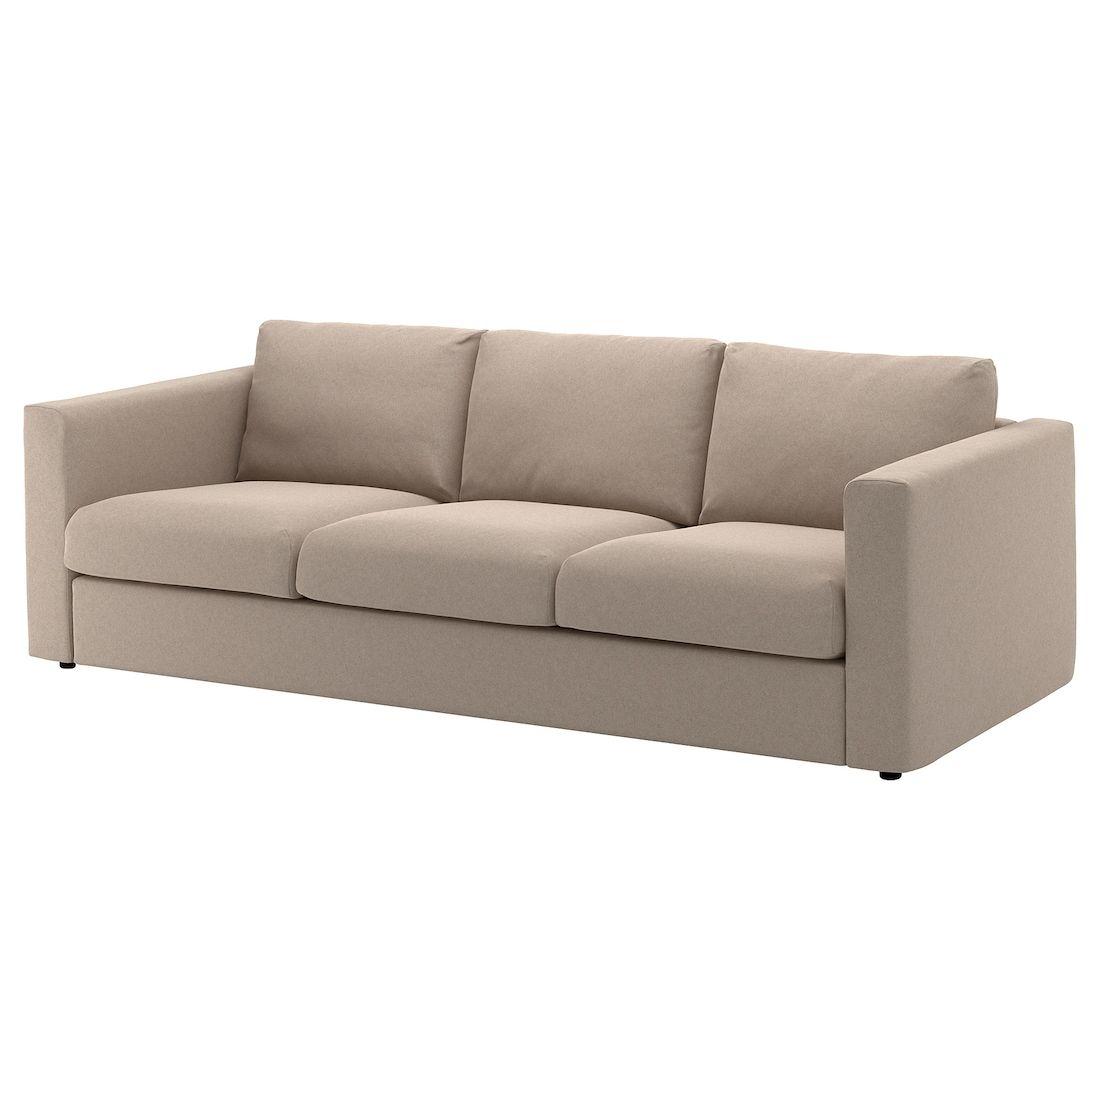 Ikea Us Furniture And Home Furnishings Ikea Vimle Ikea Sofa Ikea Vimle Sofa